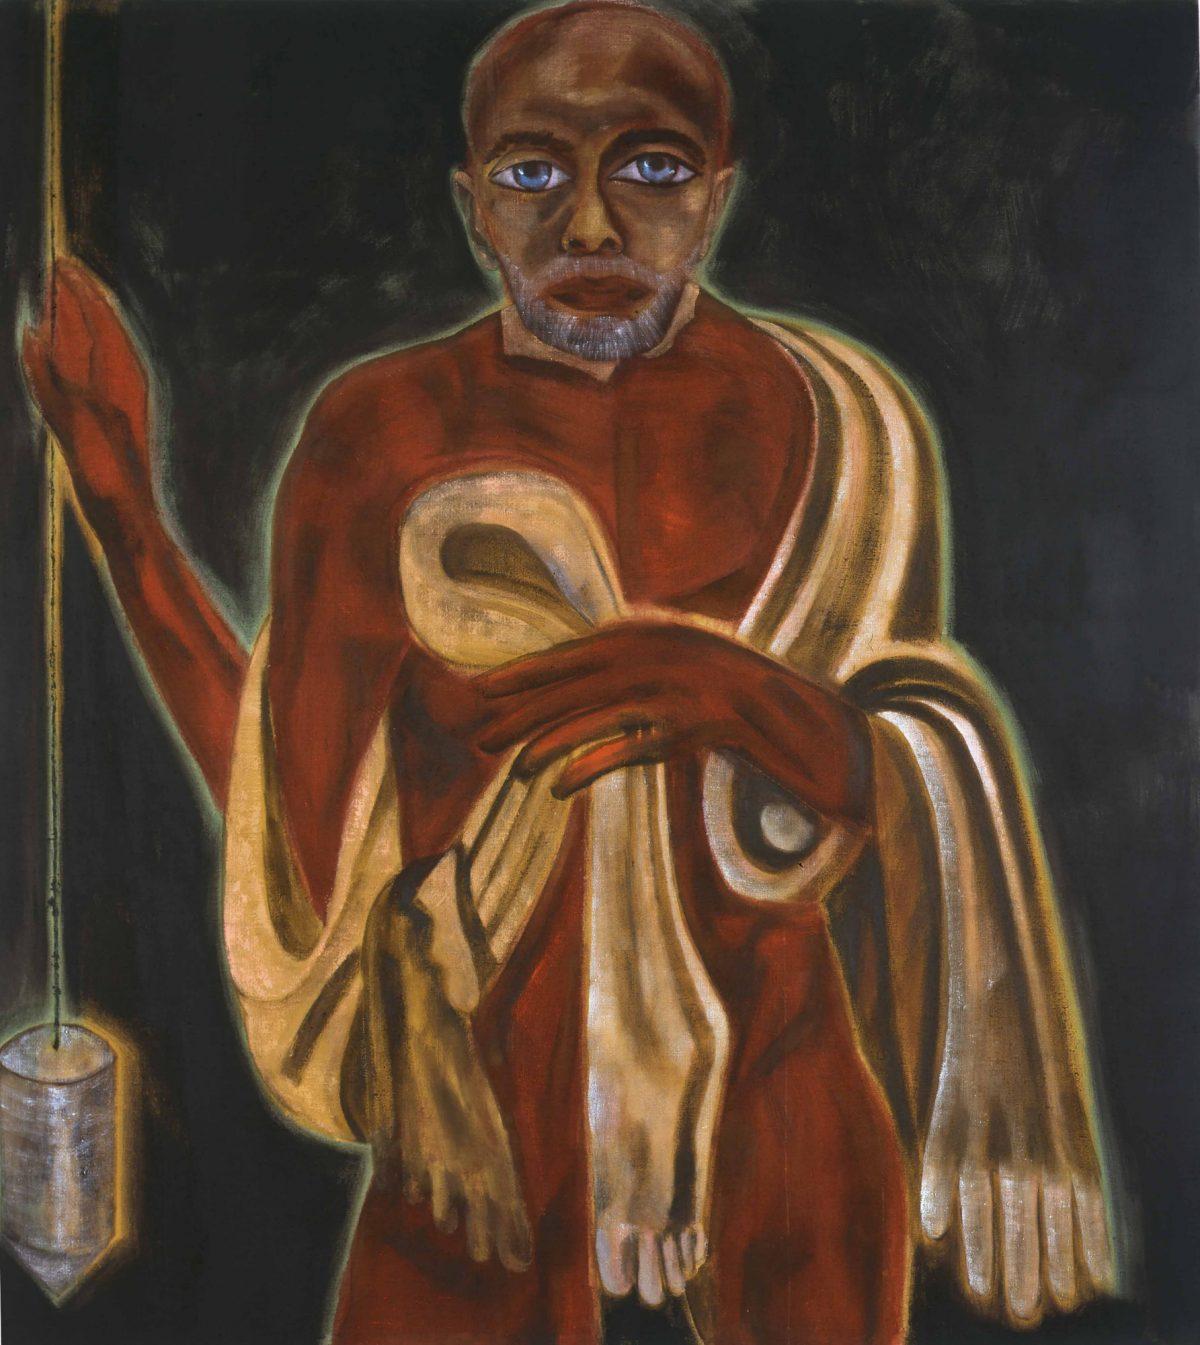 Self-Portrait as St. Bartholomew